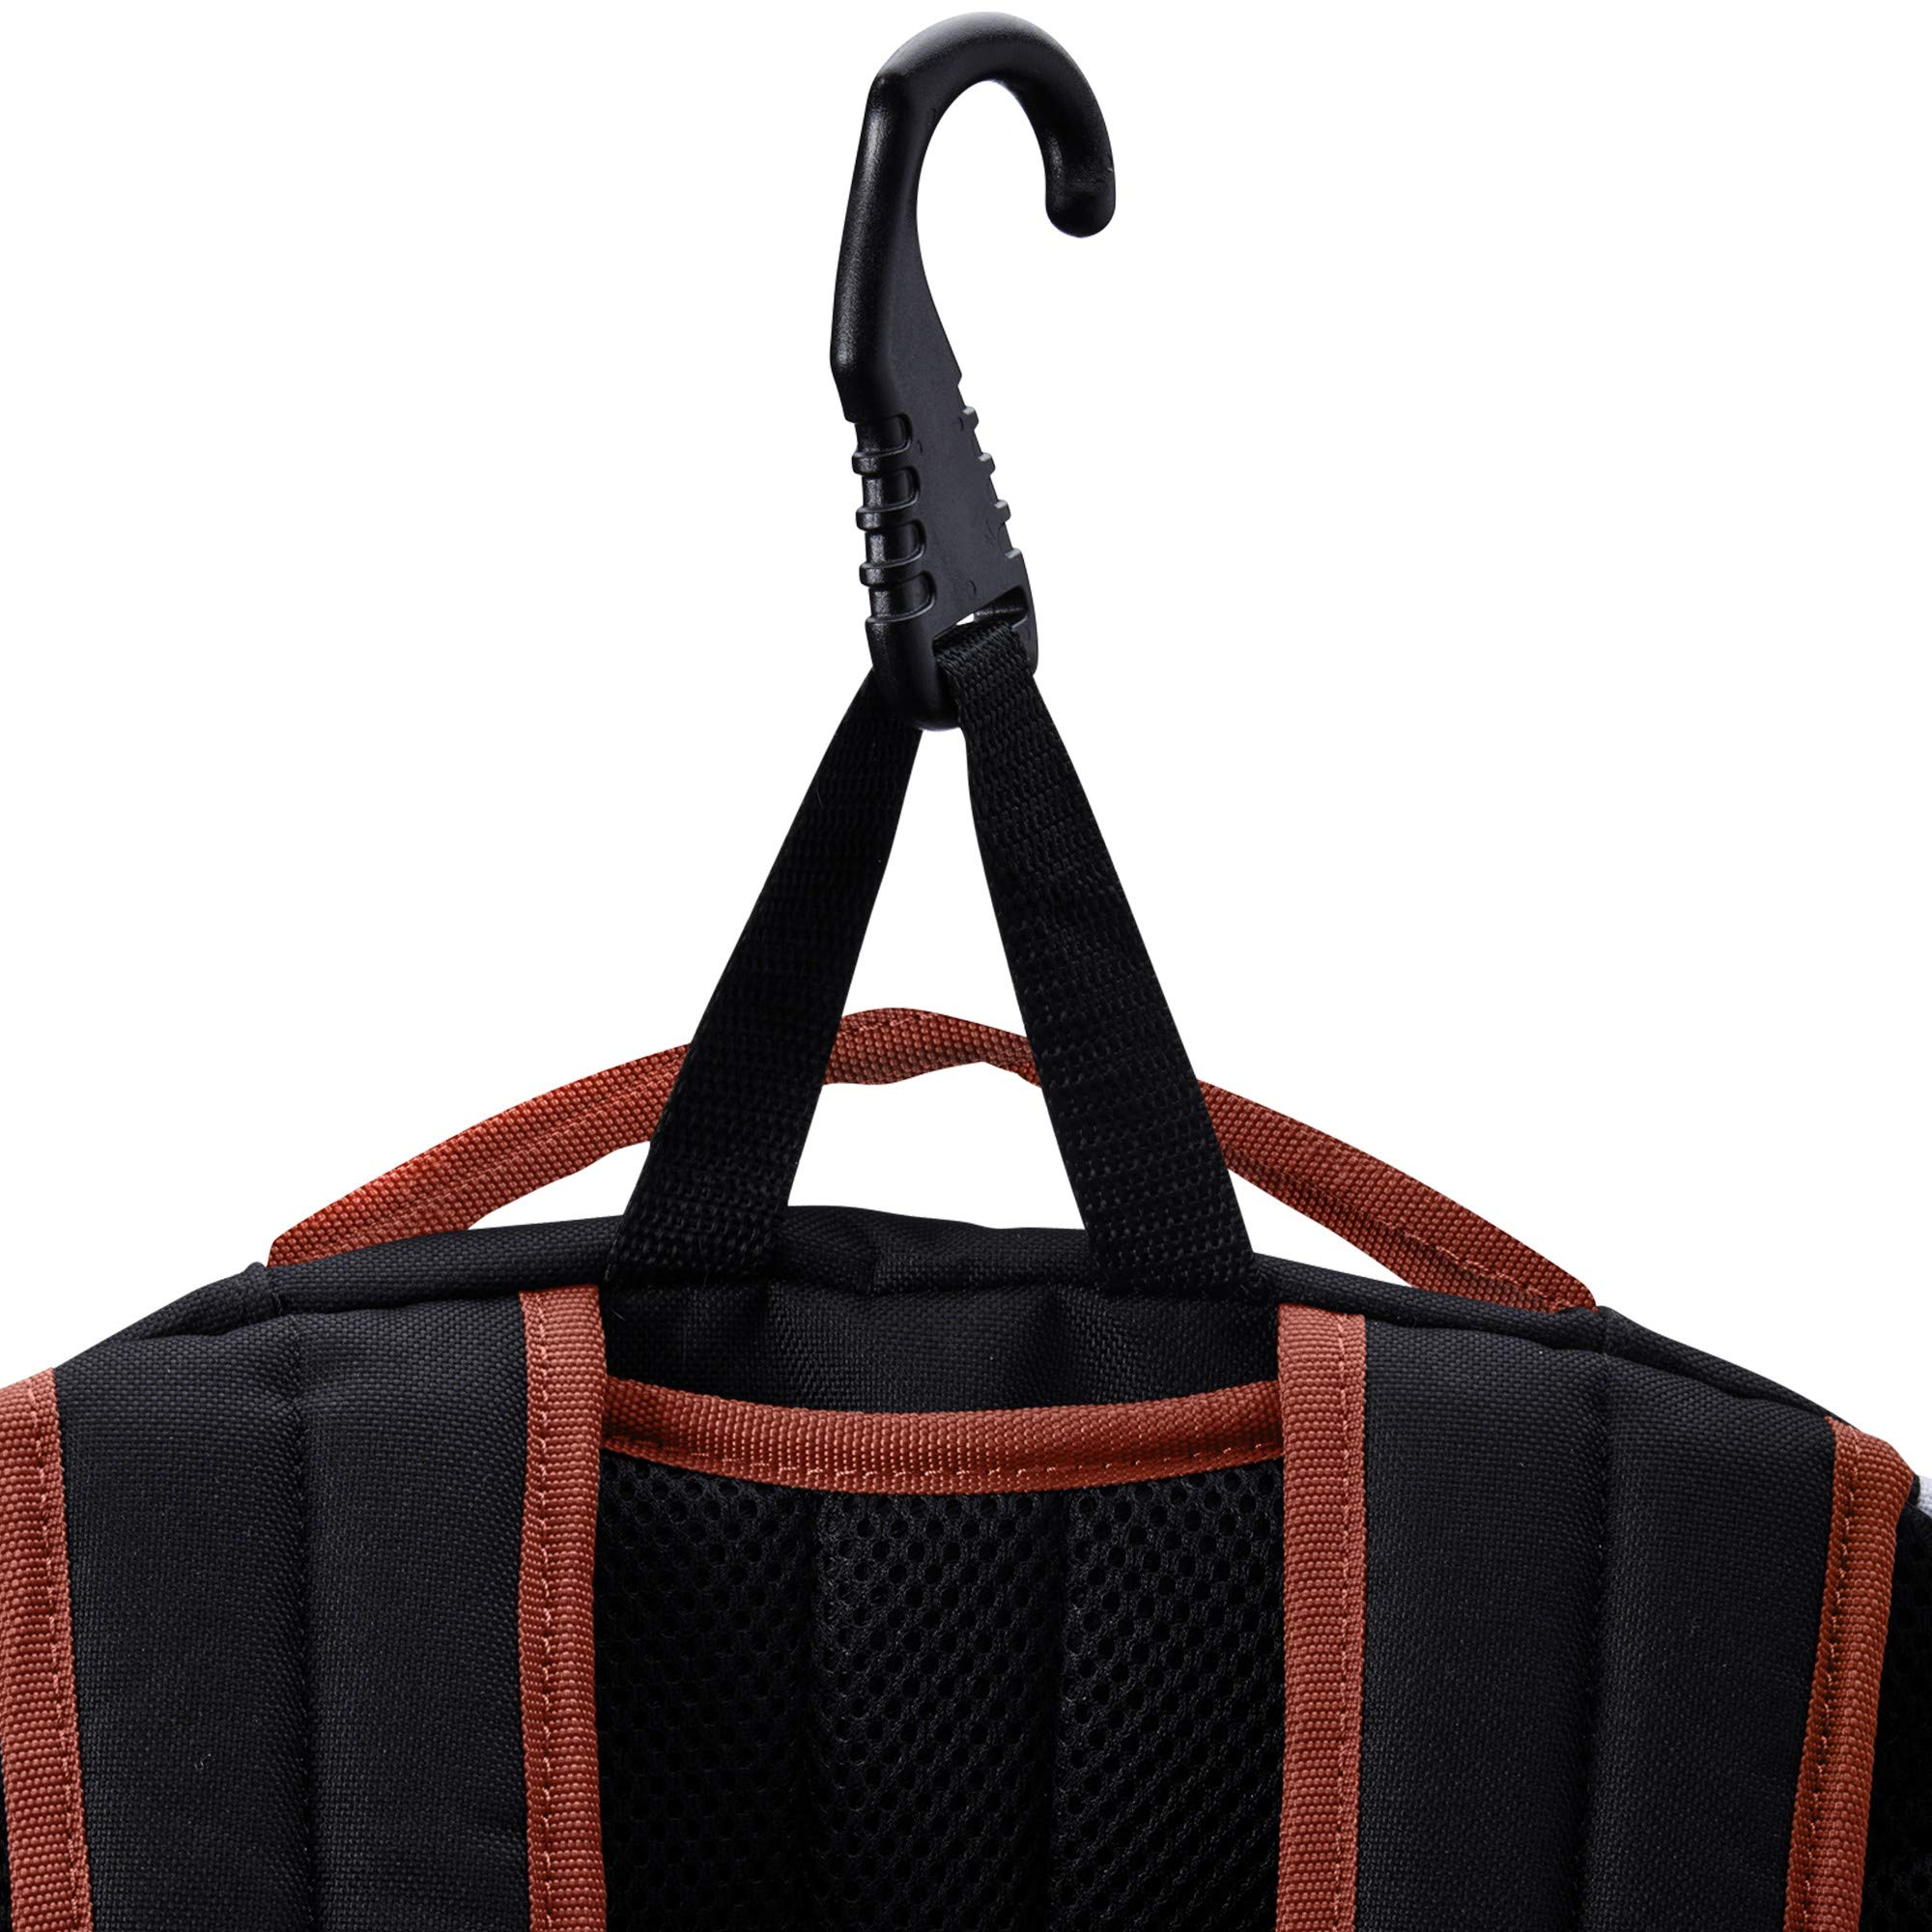 DeMarini WTD9407SC Momentum Backpack, Scarlet by DeMarini (Image #7)